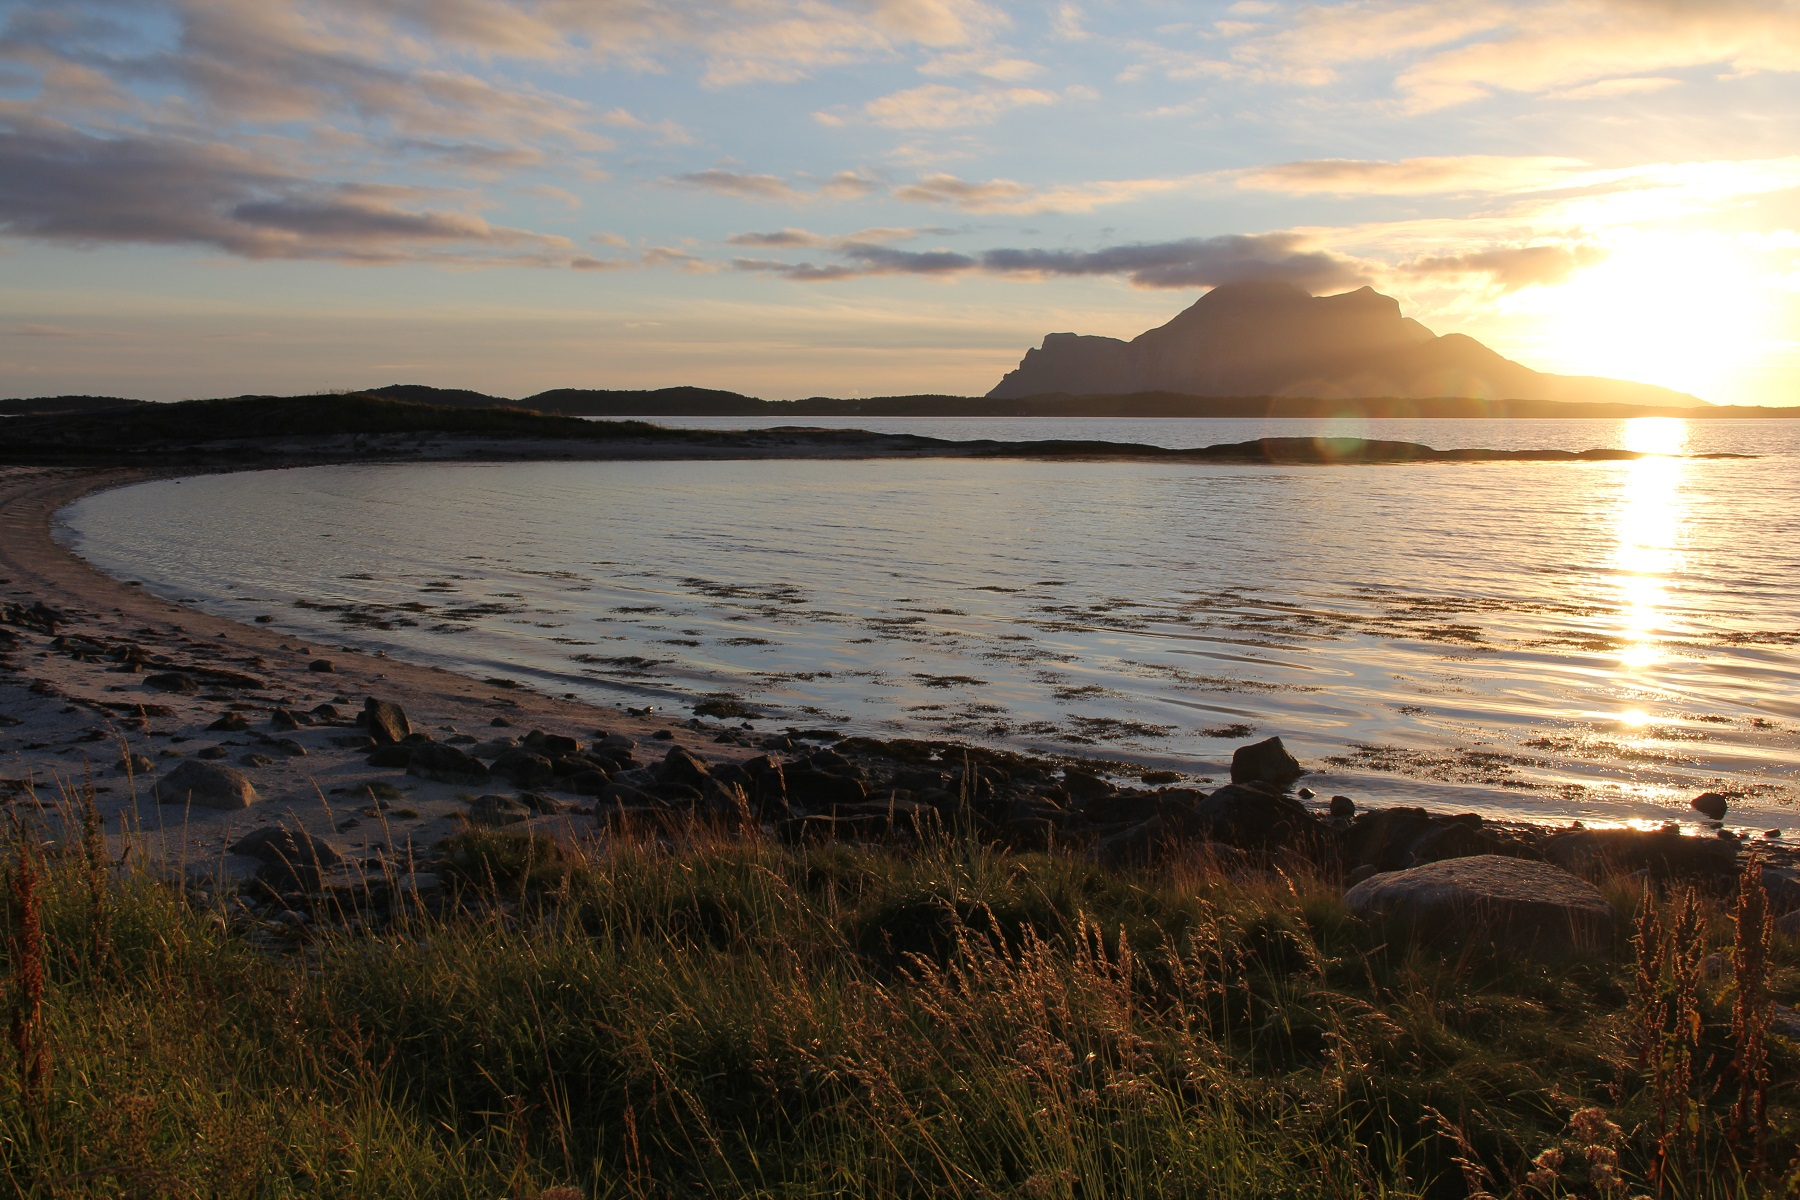 Kveldstur i landskapsvernområdet Øya Langholmen ved Inndyr i Gildeskål kommune.